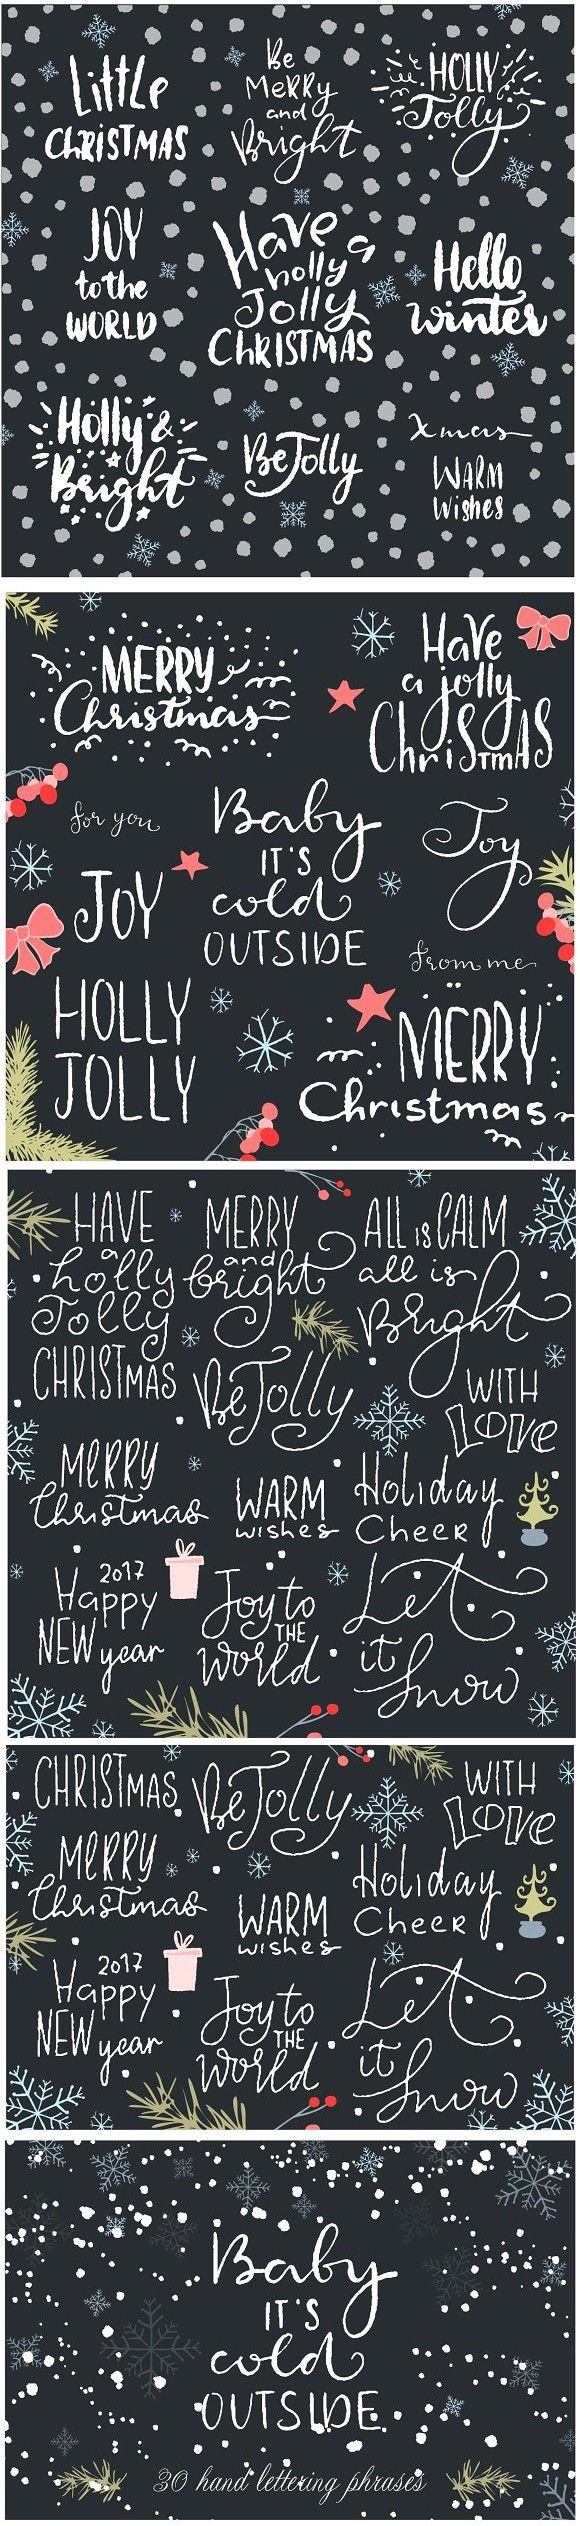 Hand lettering christmas phrases #christmas #newyear